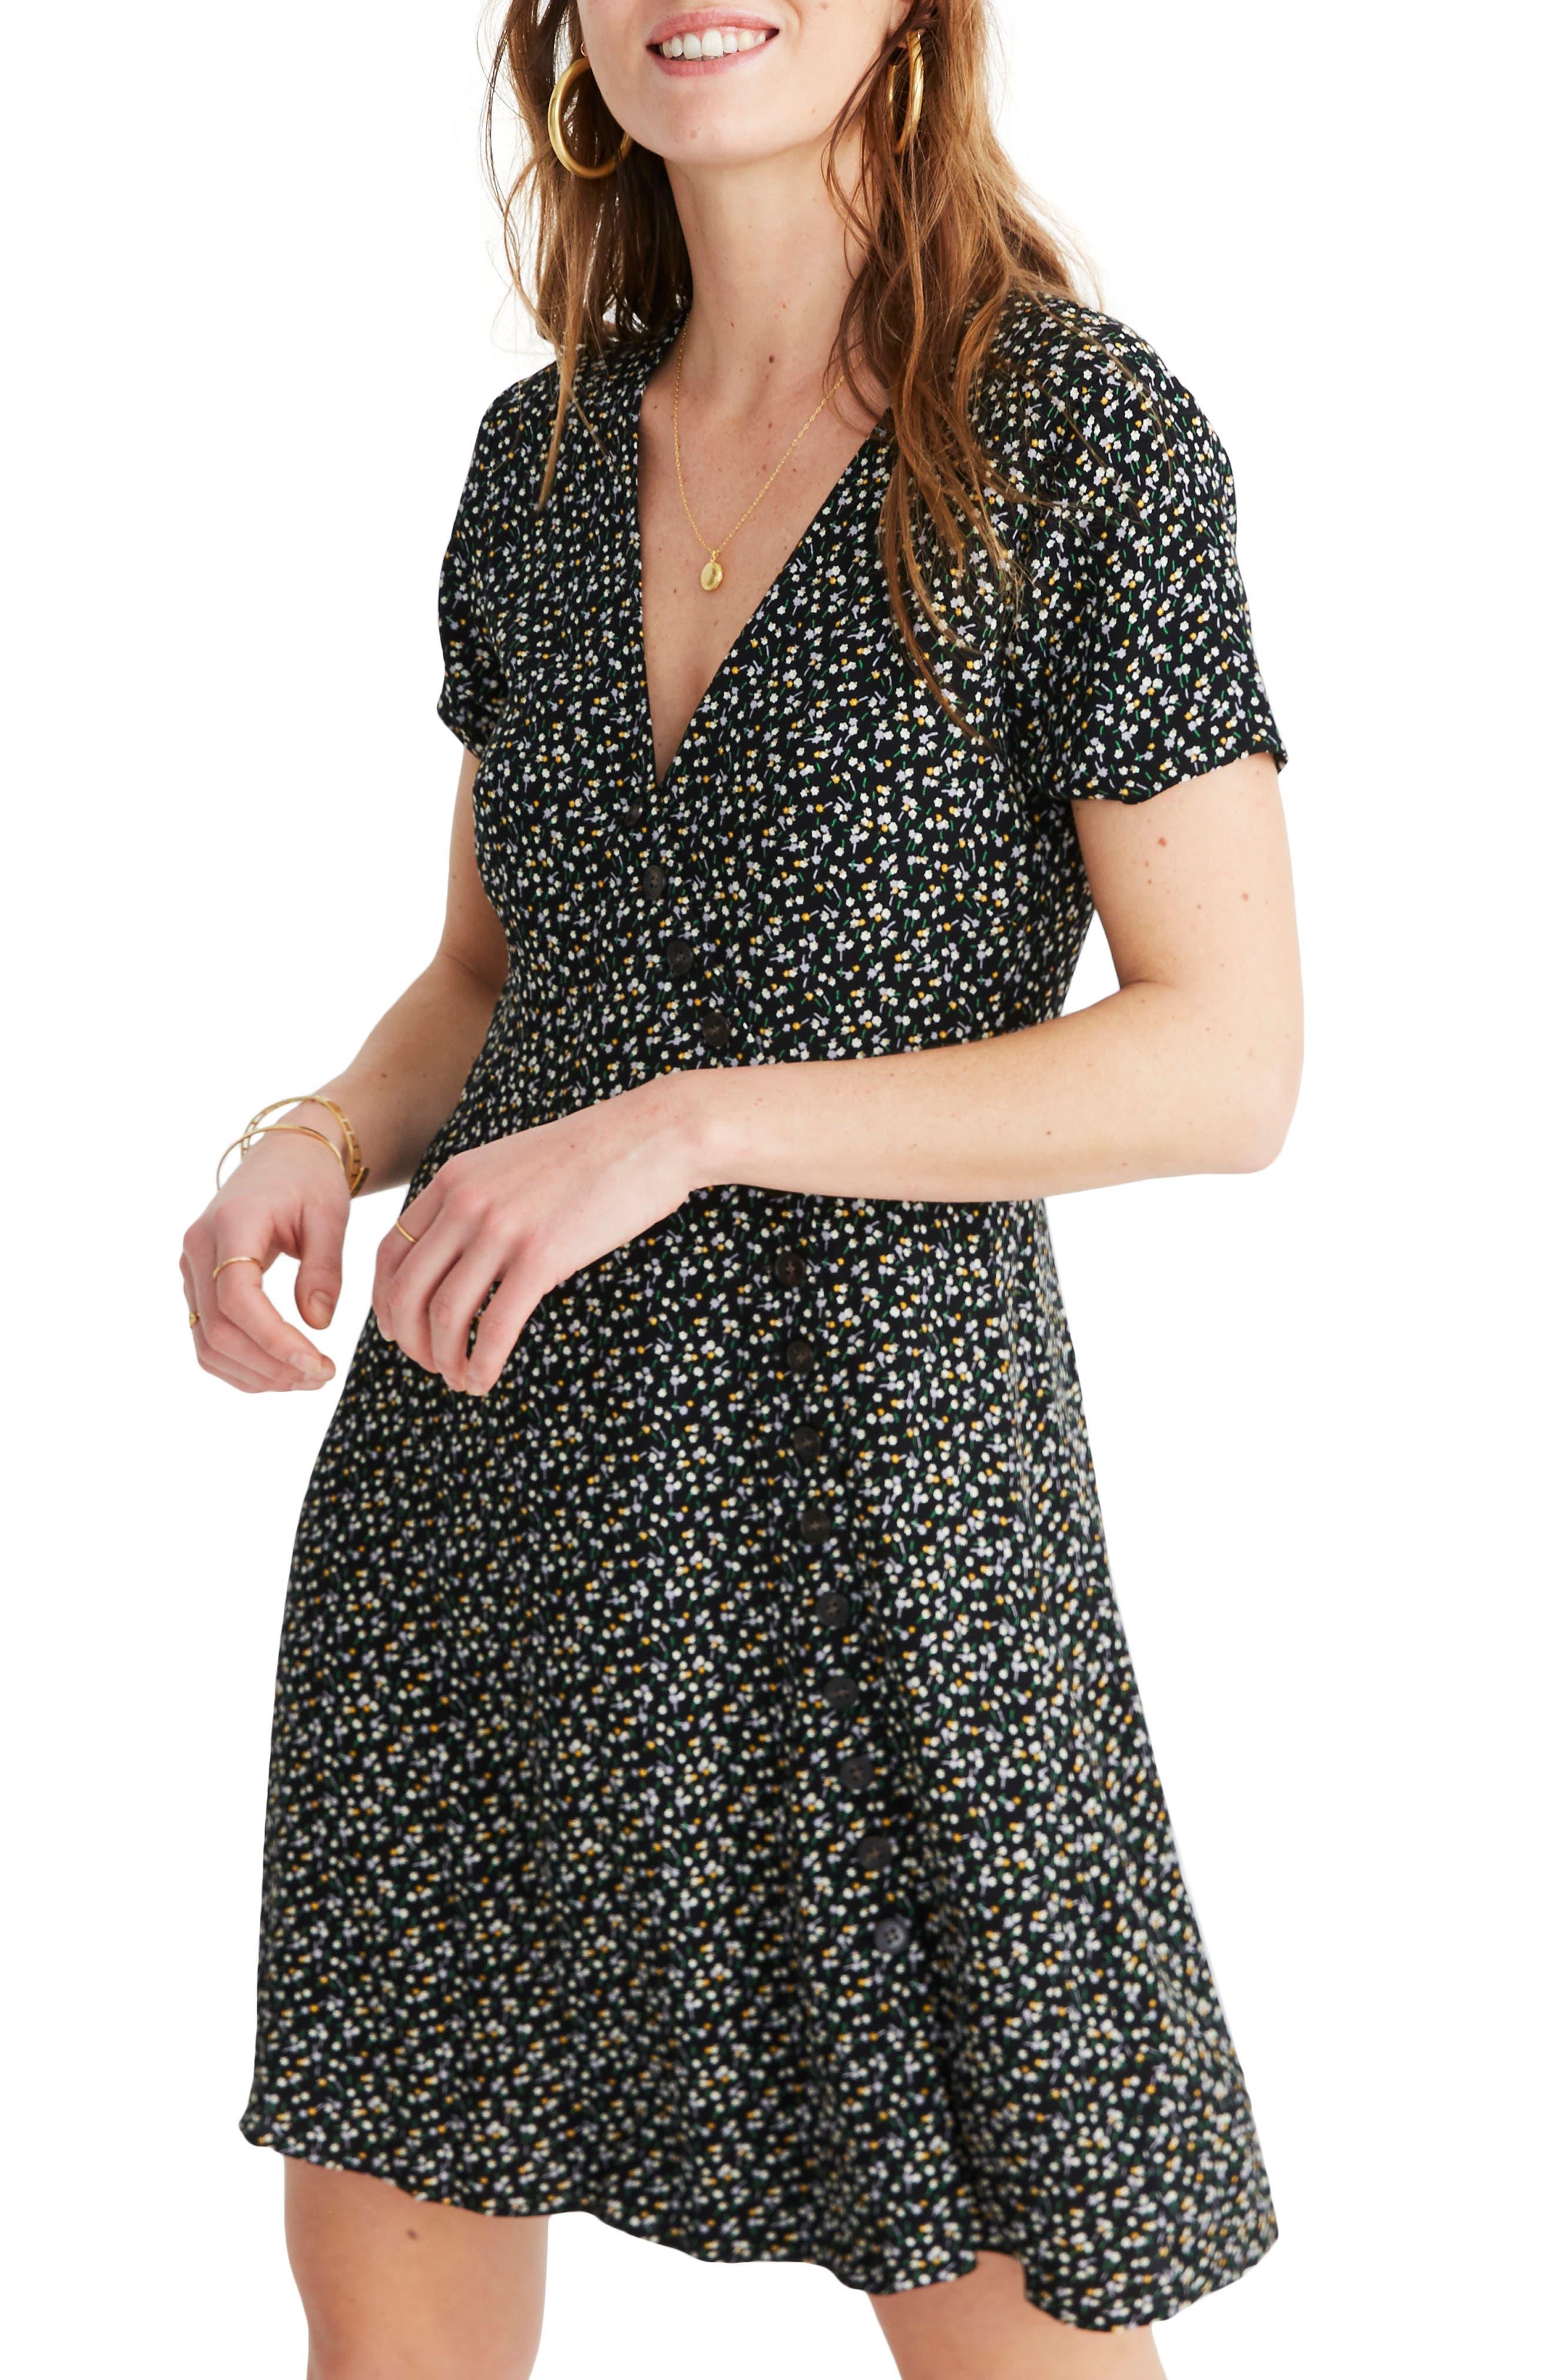 Madewell Button Wrap Dress, 4 (similar to 2) - Black